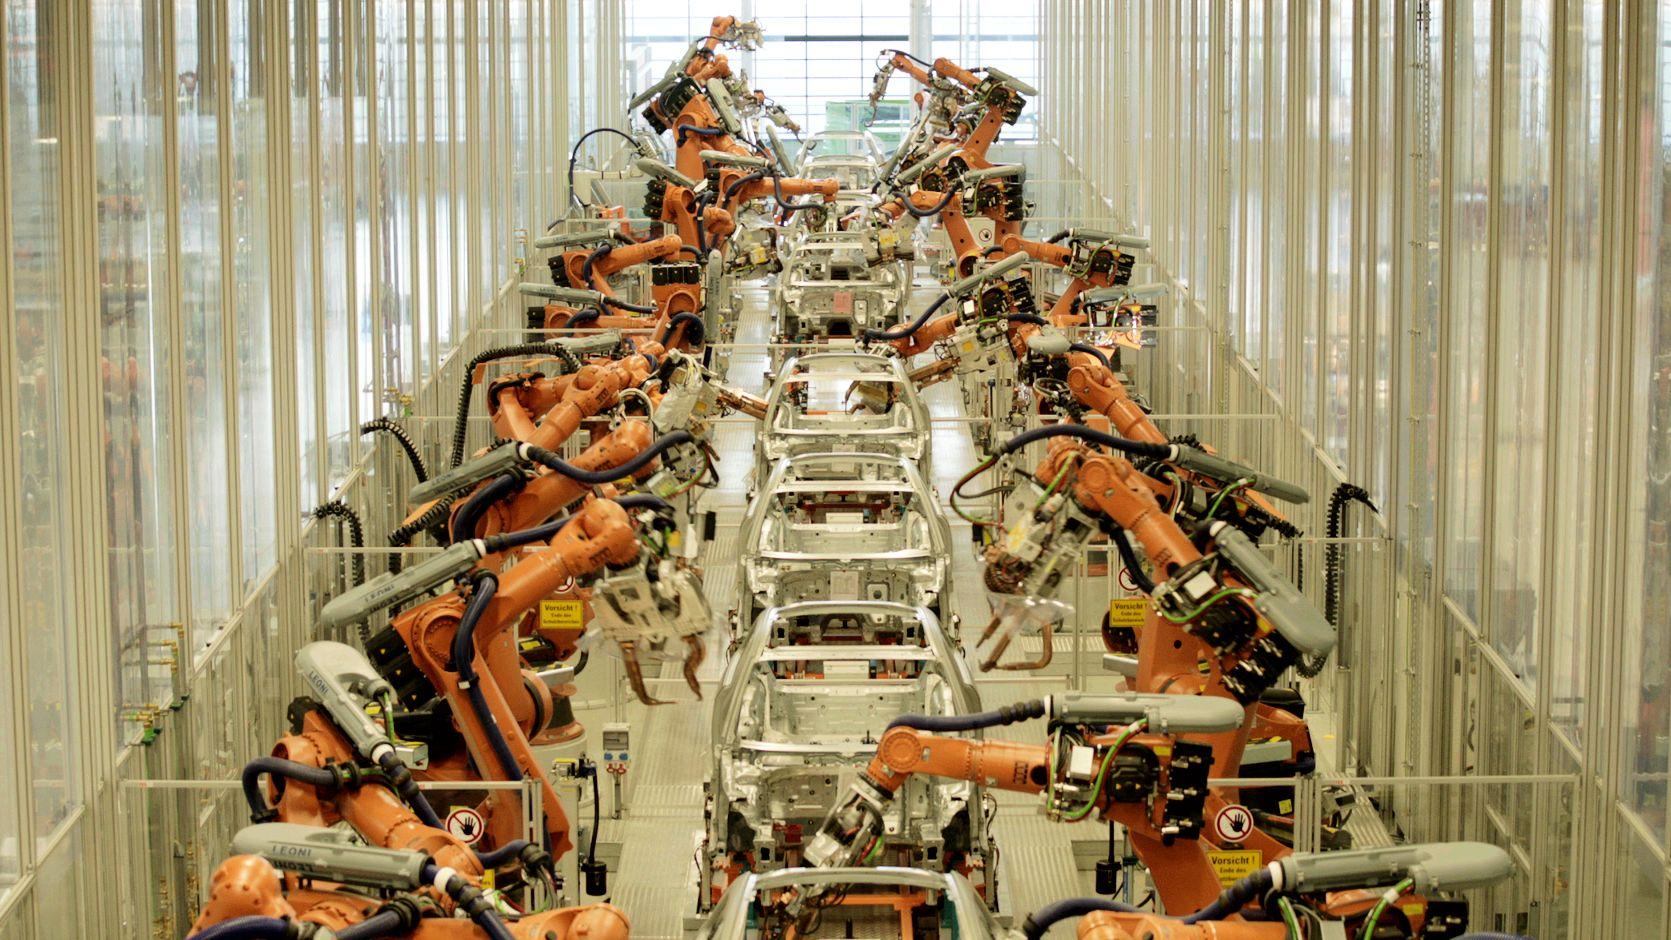 Automobilindustrie im Umbruch